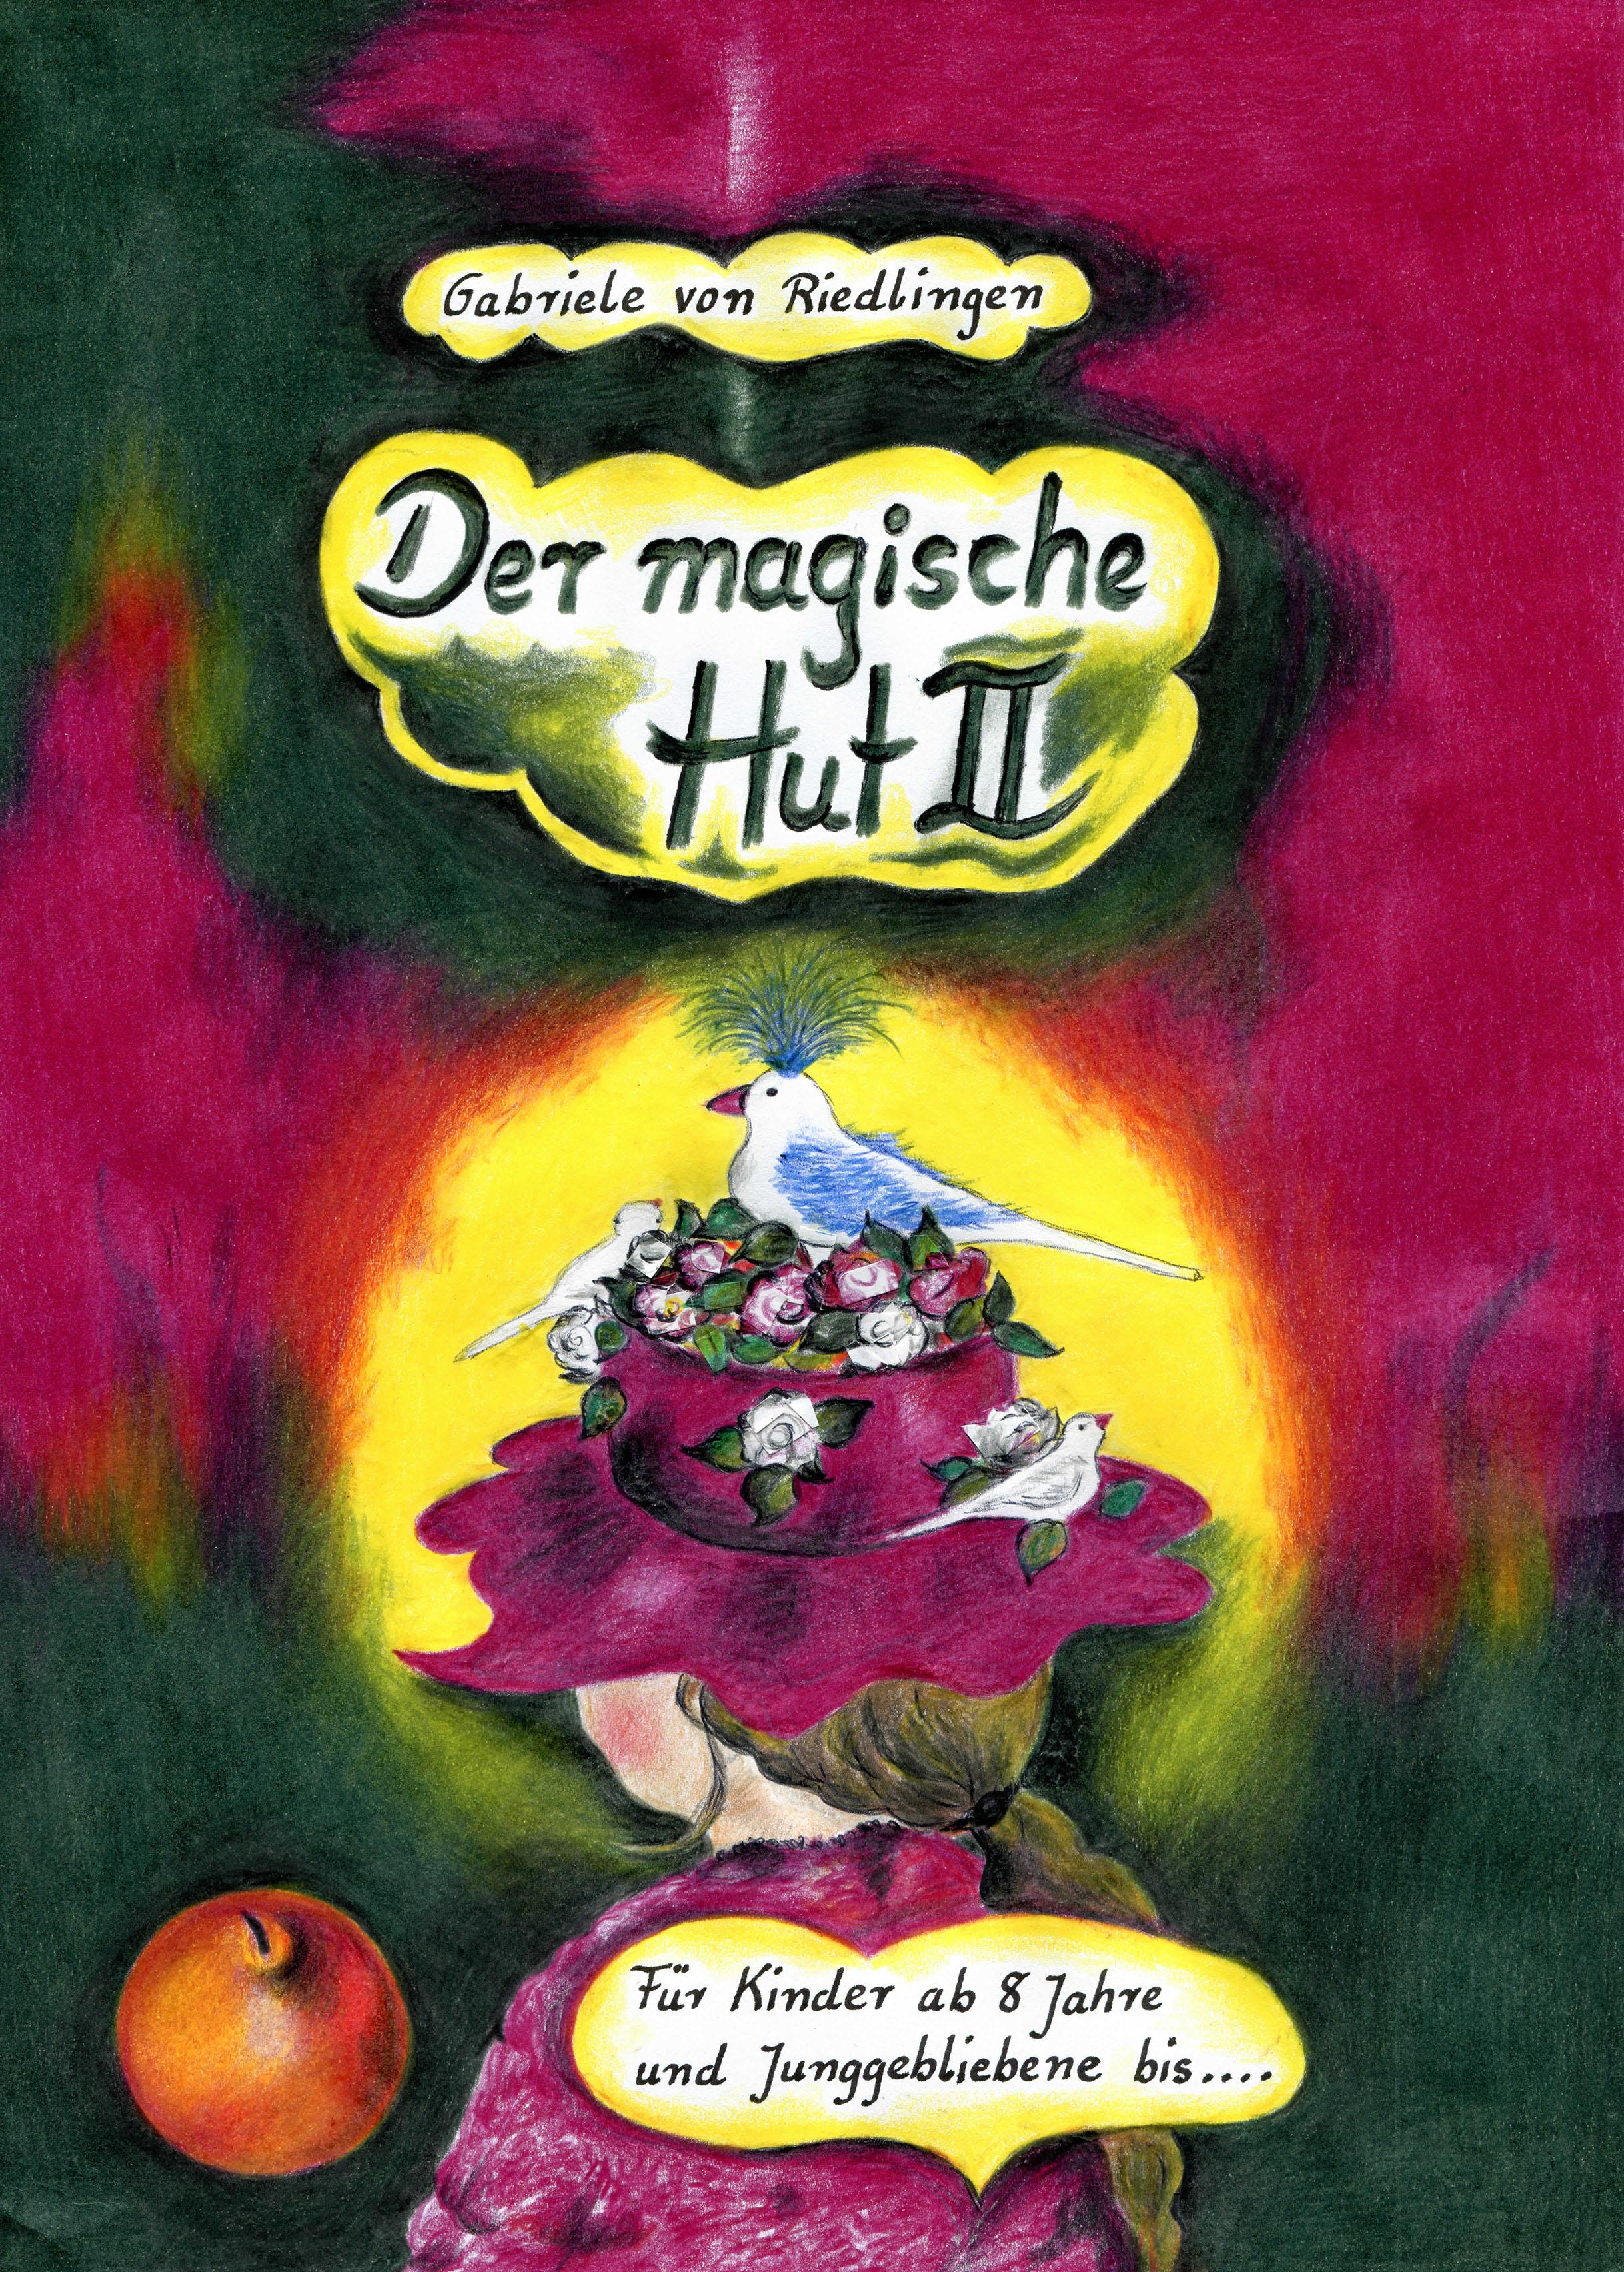 Der magische Hut II